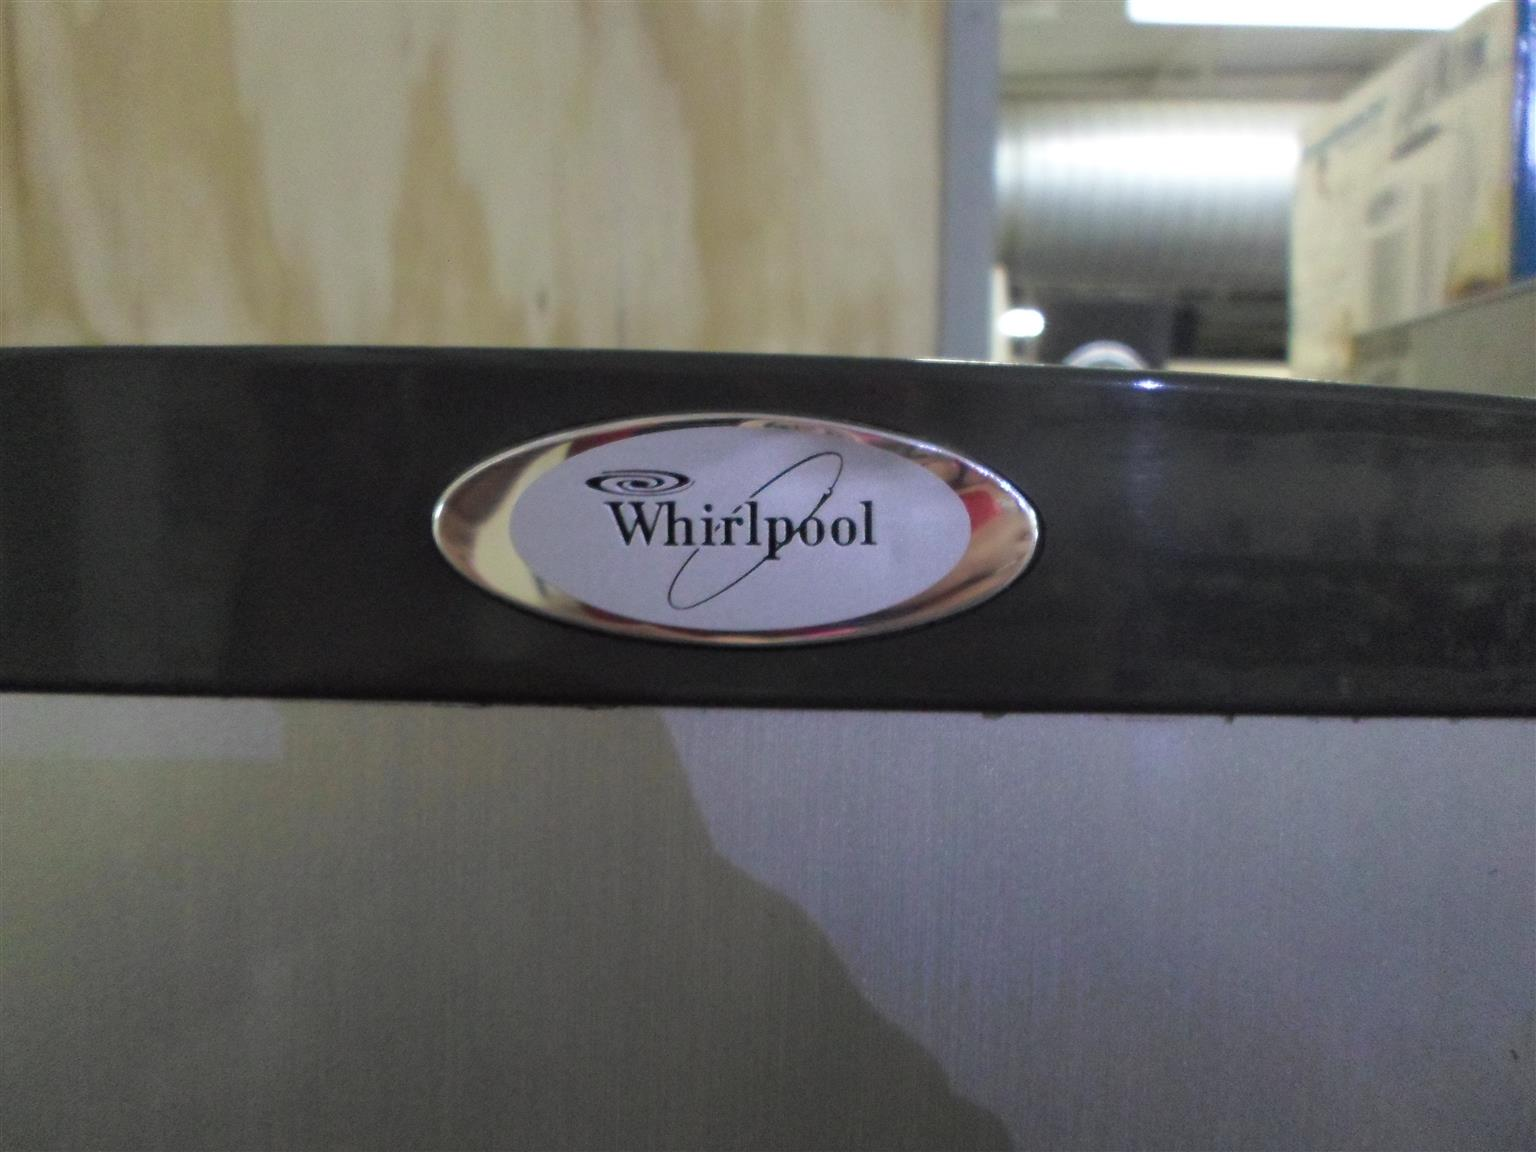 Whirlpool Fridge / Freezer